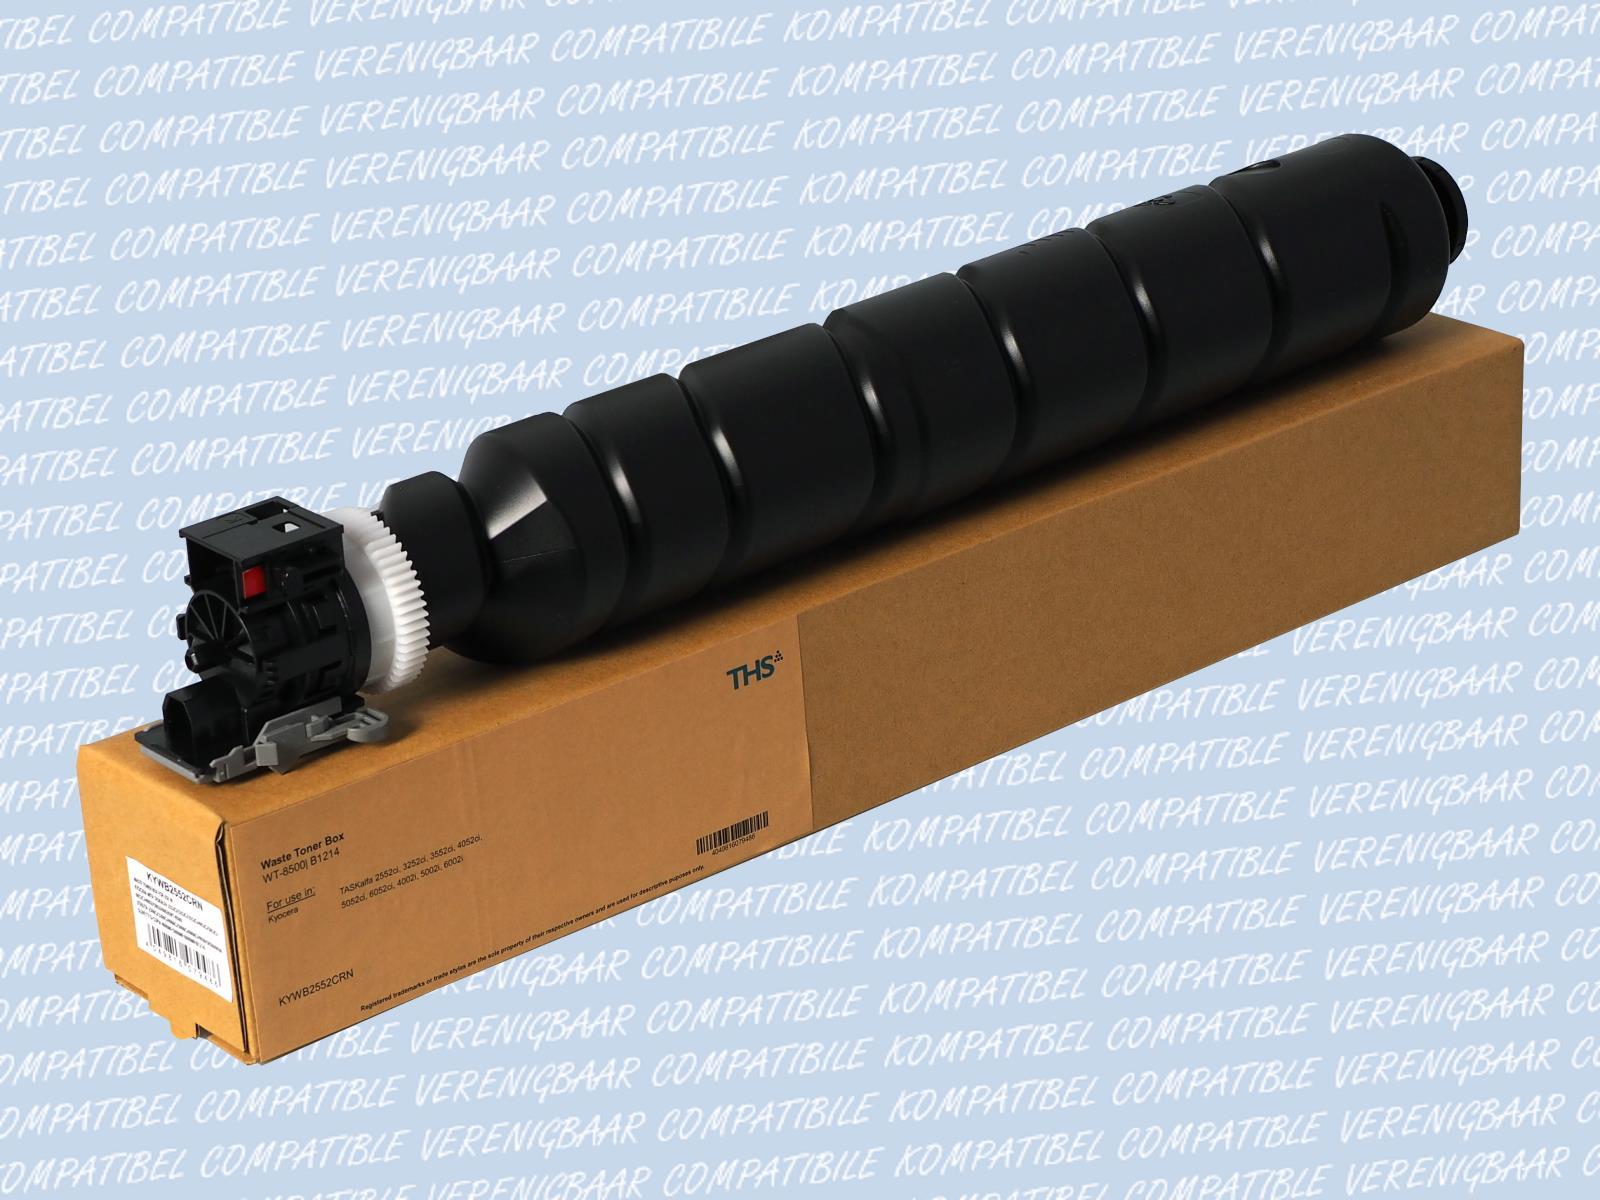 Compatible Waste Toner Box Typ: WT-8500 for Kyocera TASKalfa: 2552ci /  3252ci / 3552ci / 4002i / 4052ci / 5002i / 5052ci / 6002i / 6052ci